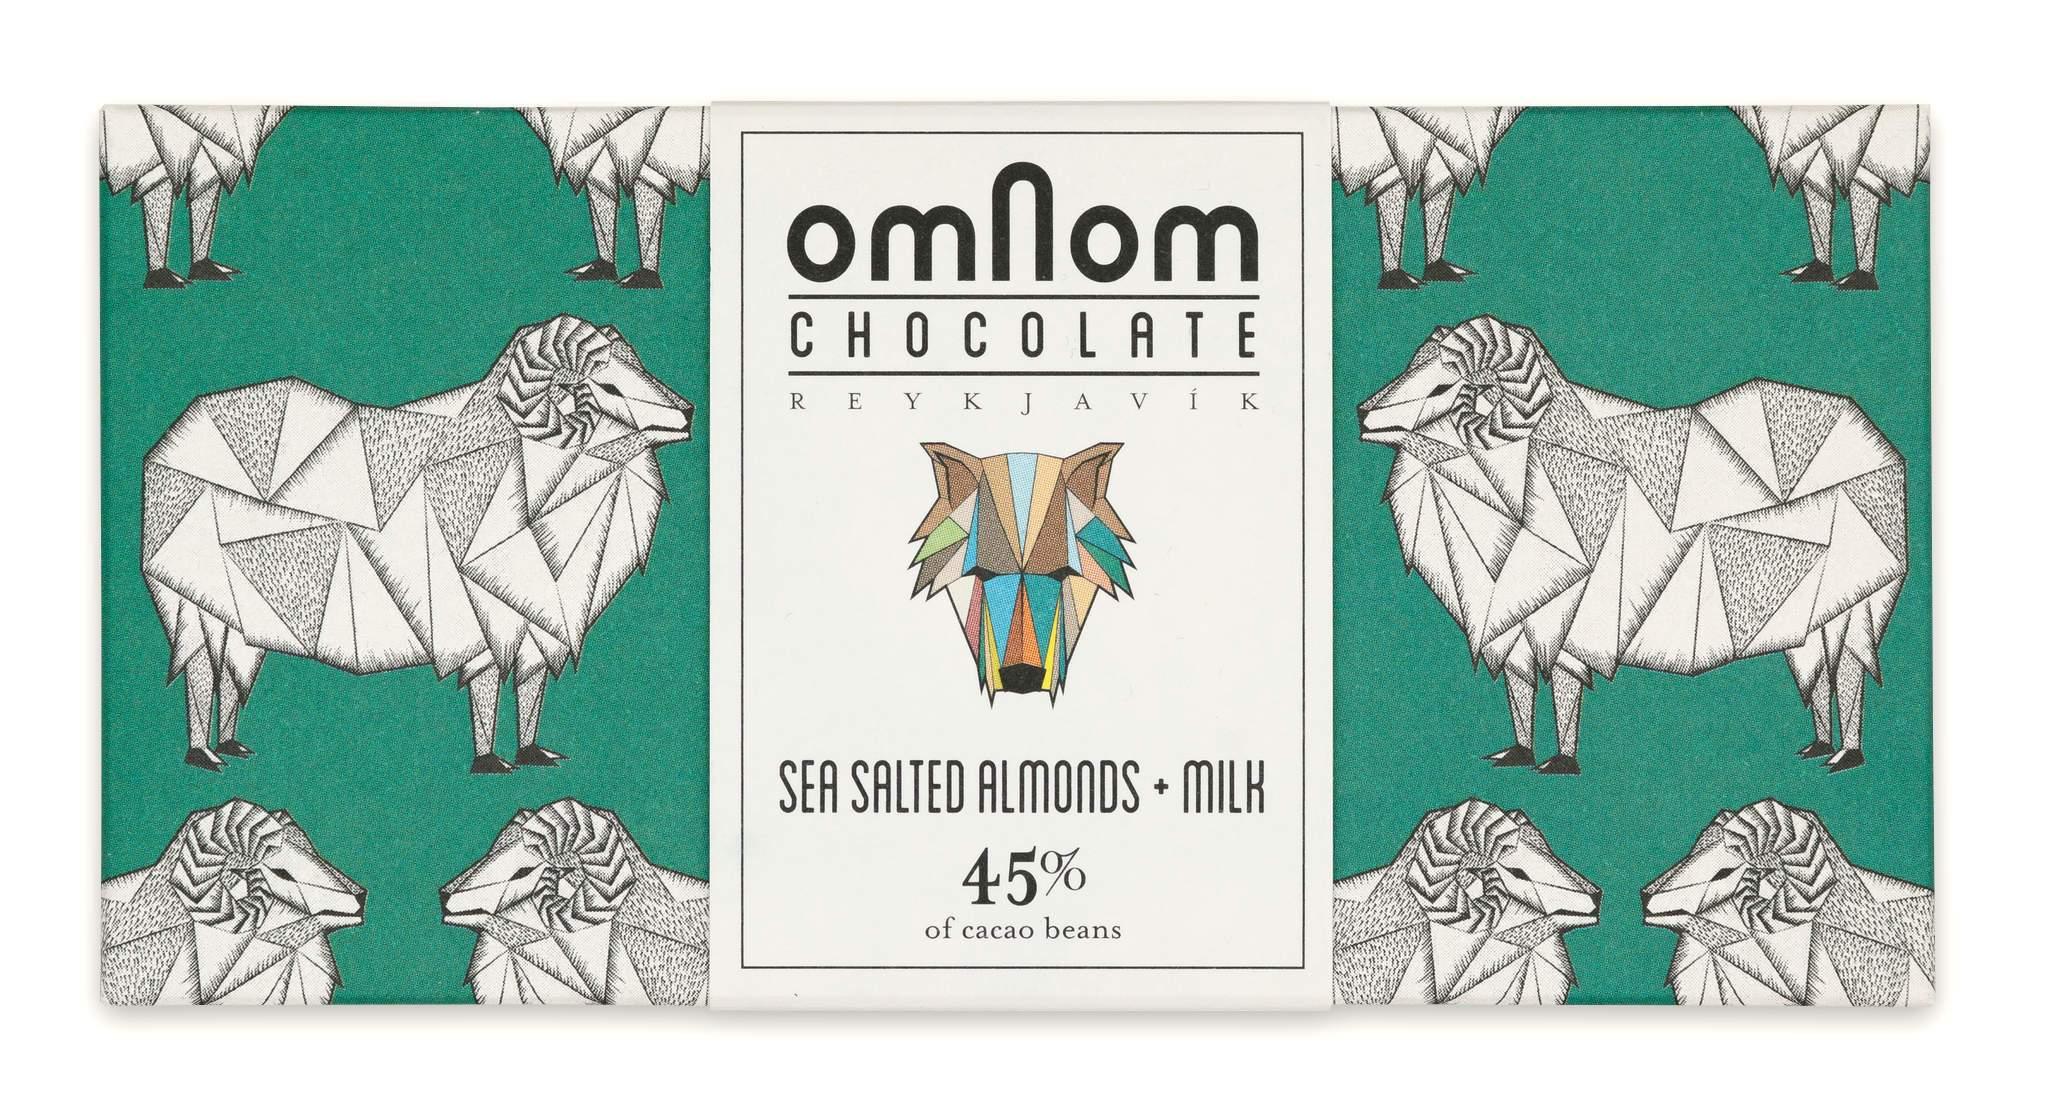 OMNOM Chocolate | Milchschokolade »Sea Salted Almonds & Milk« 32%